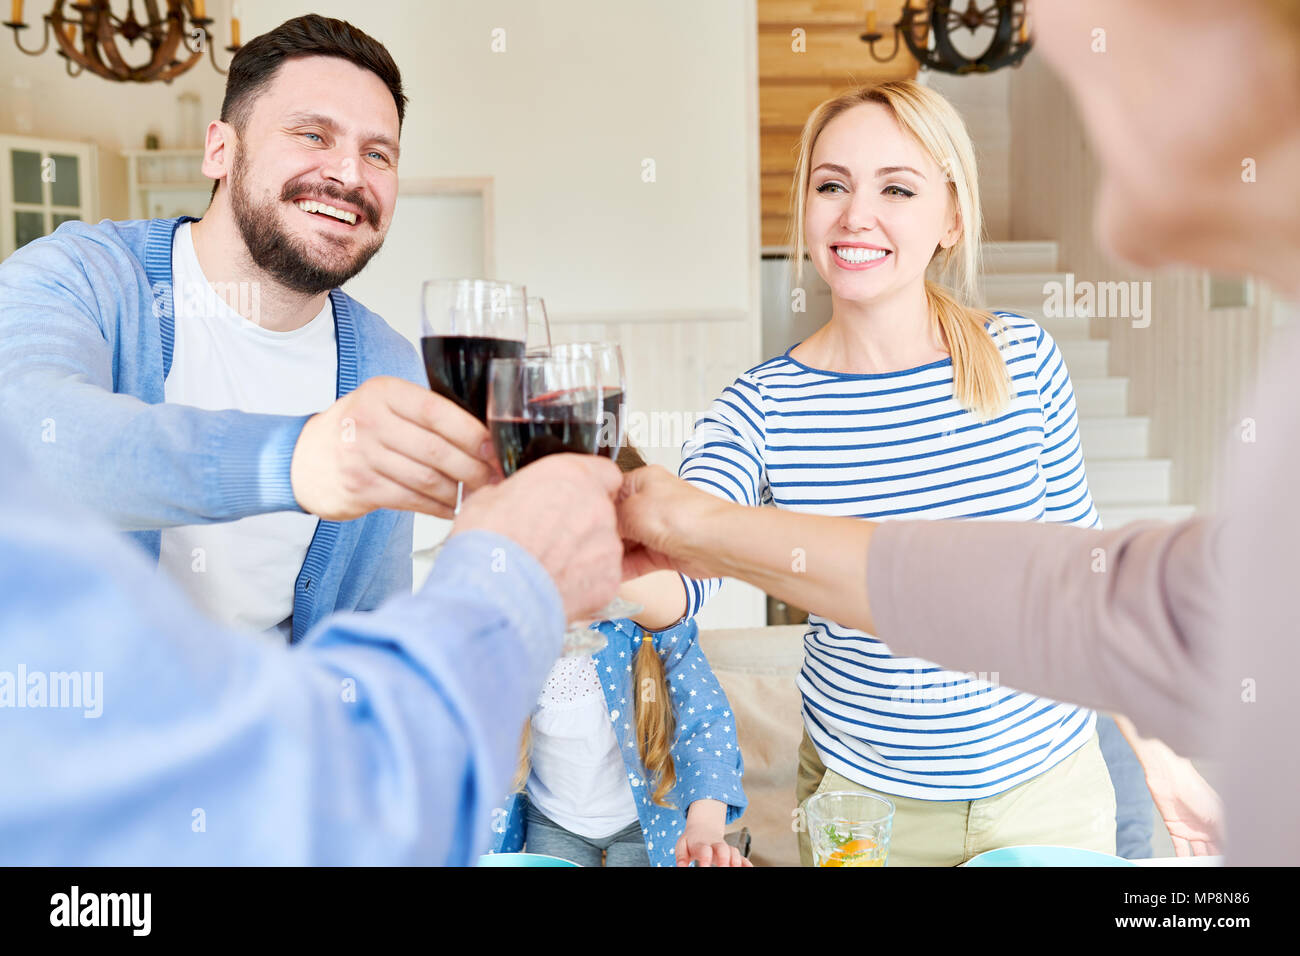 Family Clinking Glasses at Holiday Celebration - Stock Image